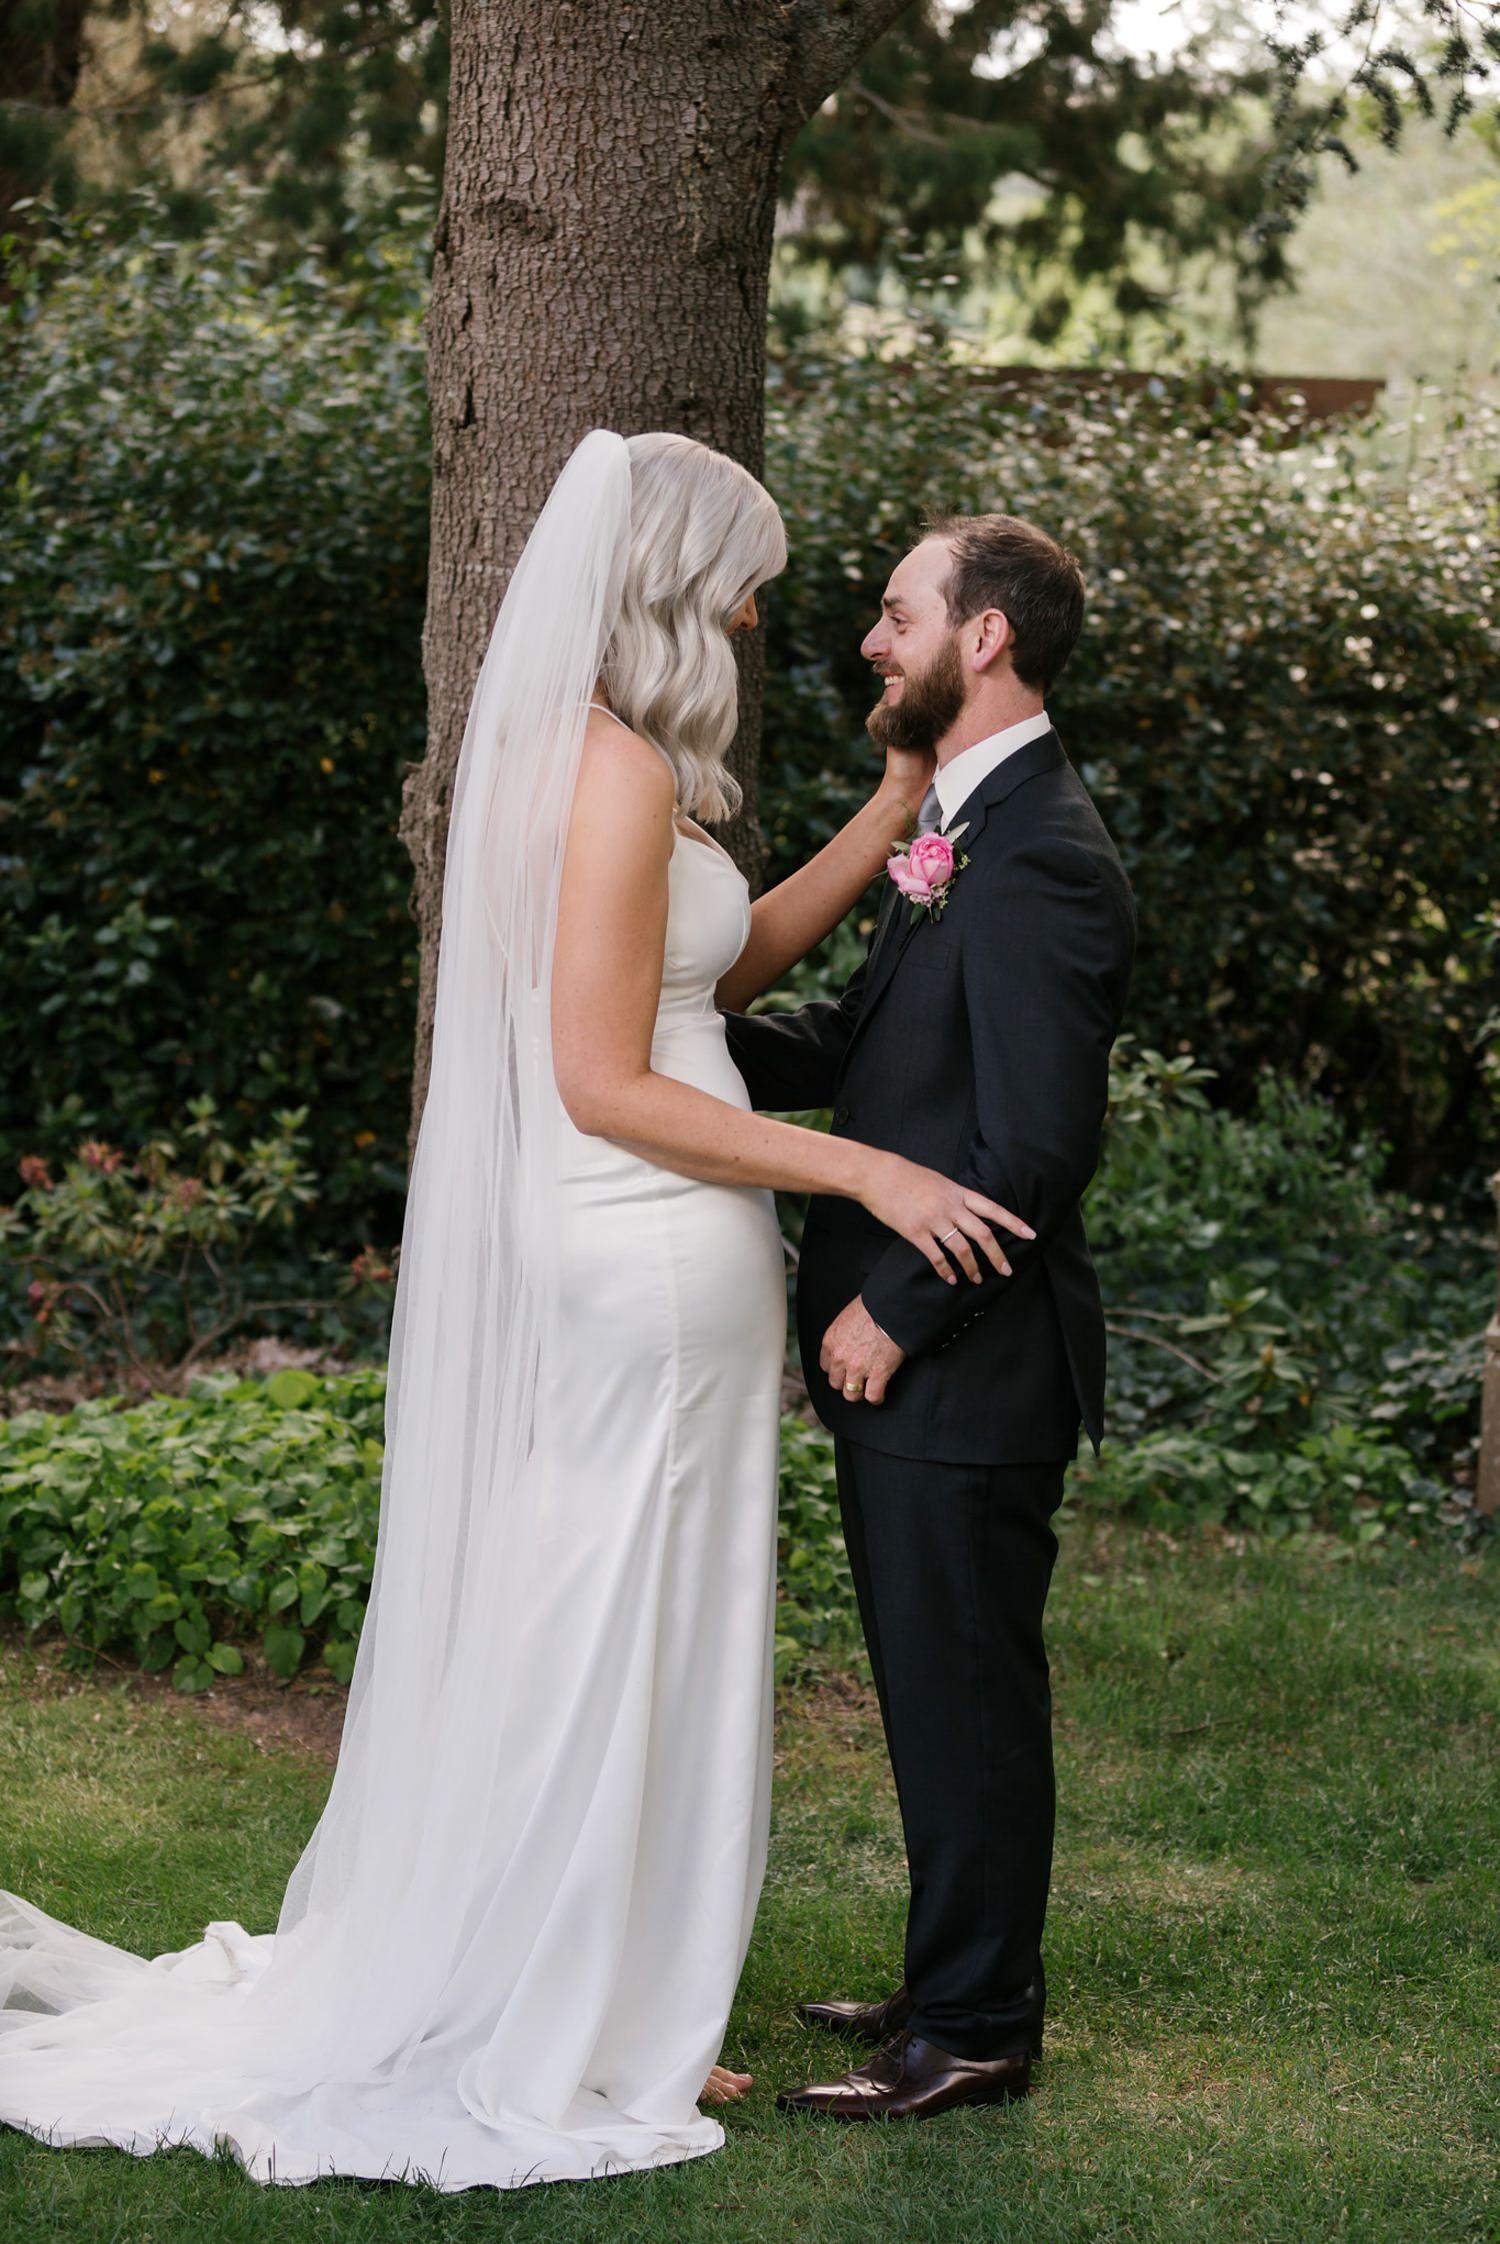 brea luke erin latimore photography athol gardens wedding blayney 17.jpg